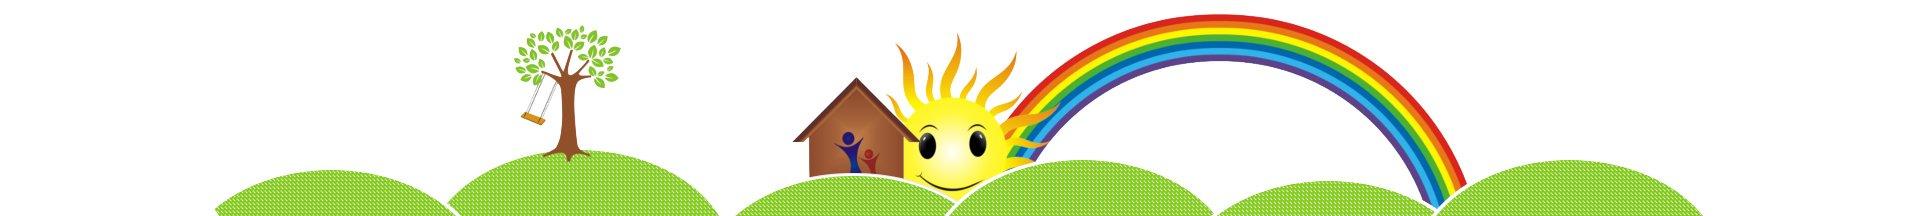 1920x216 Sunshine Montessori Academy